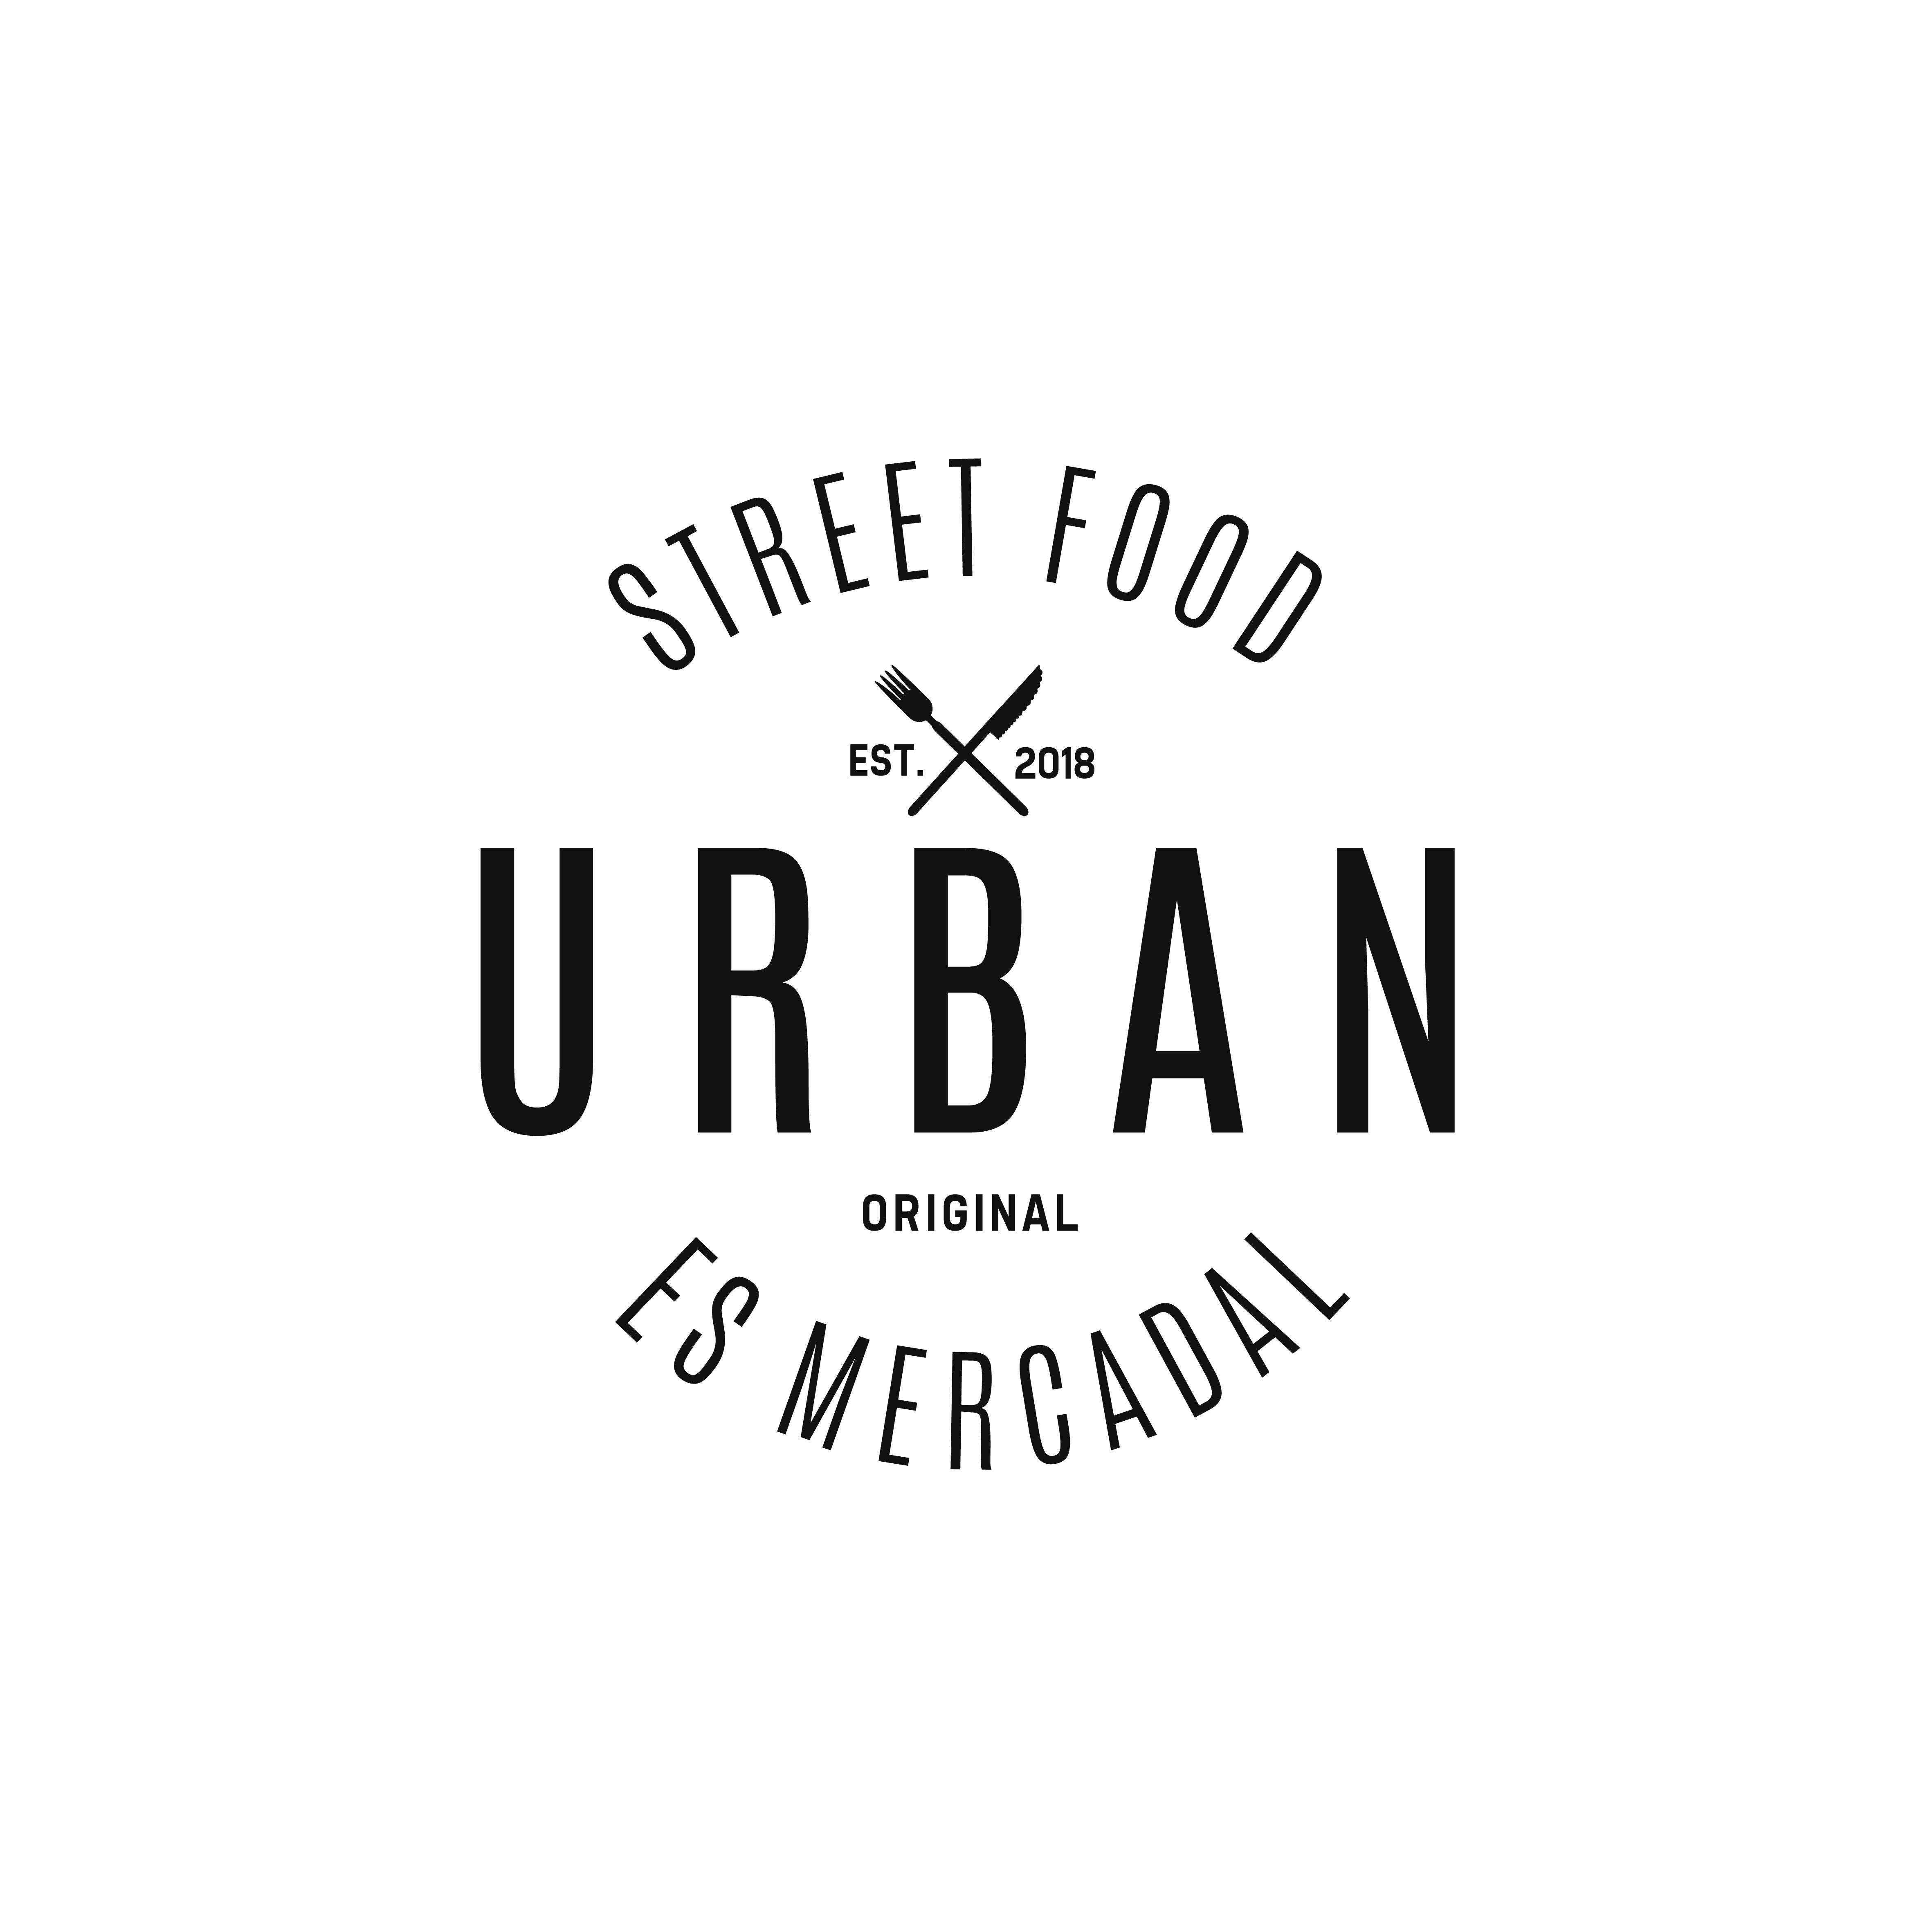 urban street food logo